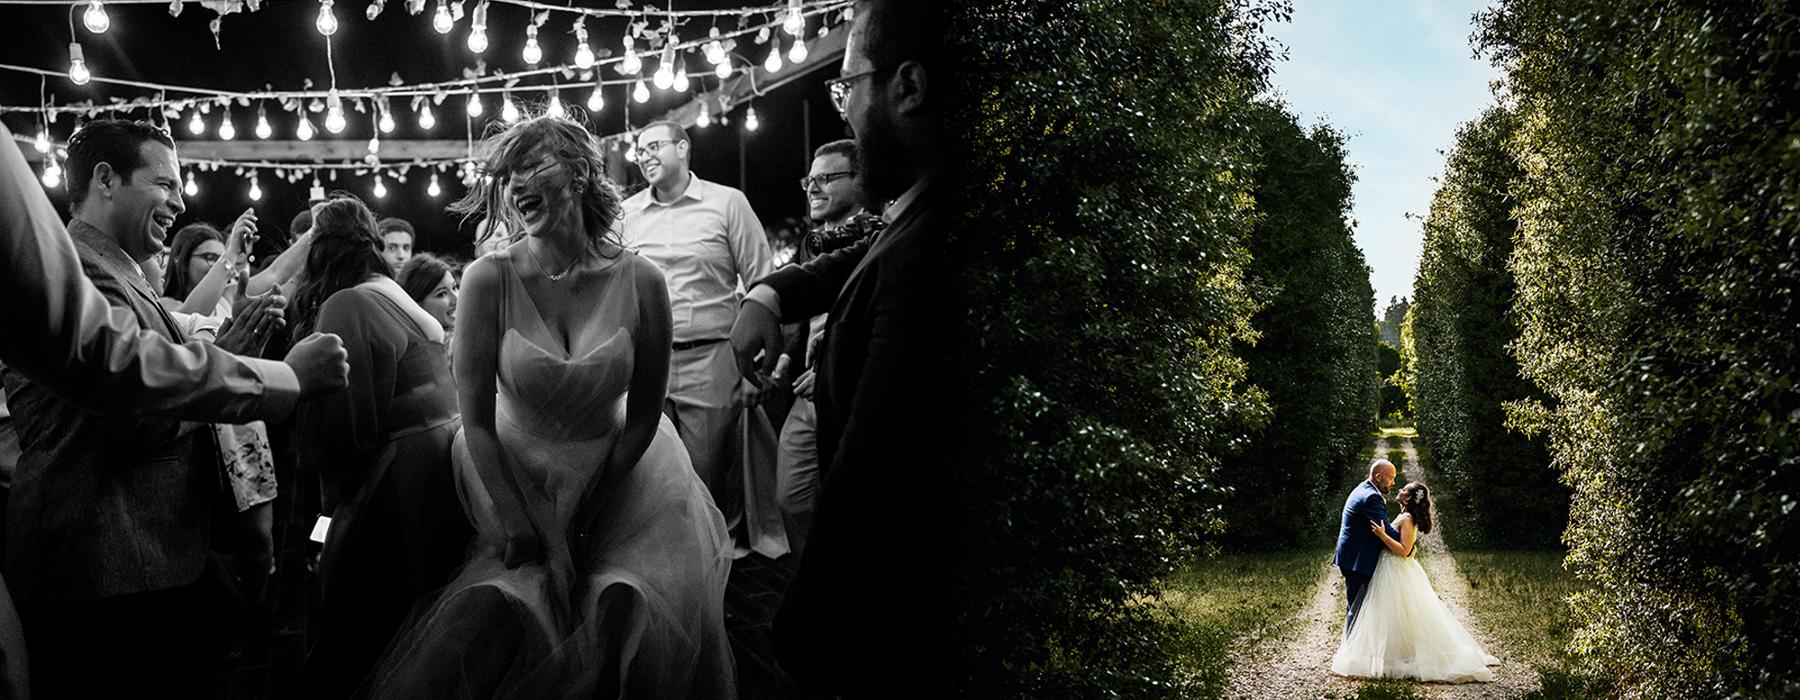 Wedding lighting scenario